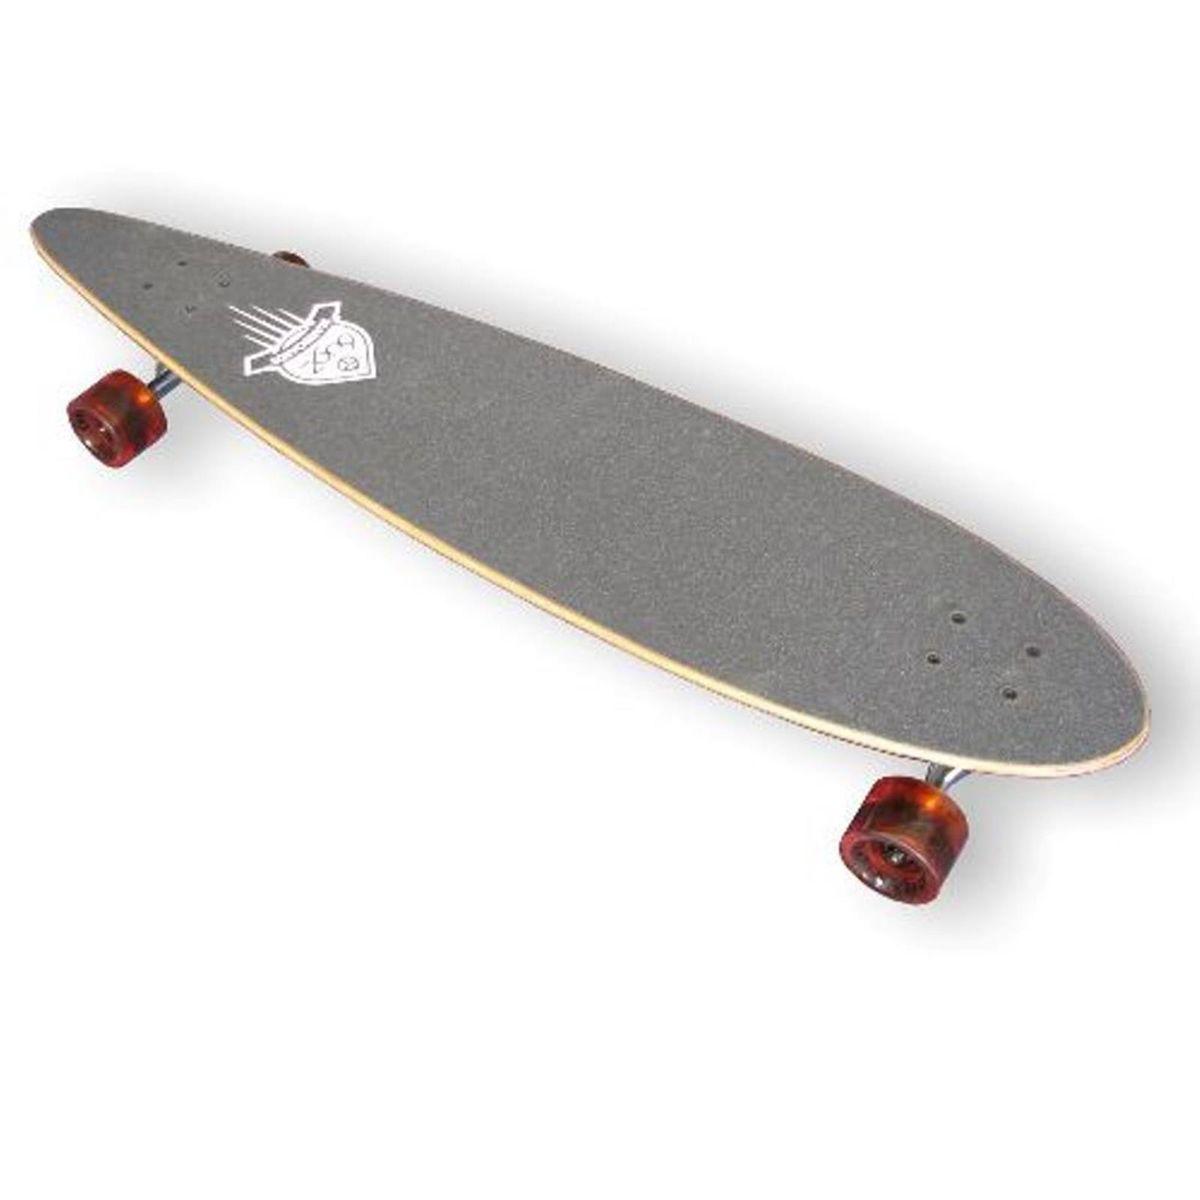 bugz skateboard longboard cruiser 117 skateboarding boards. Black Bedroom Furniture Sets. Home Design Ideas